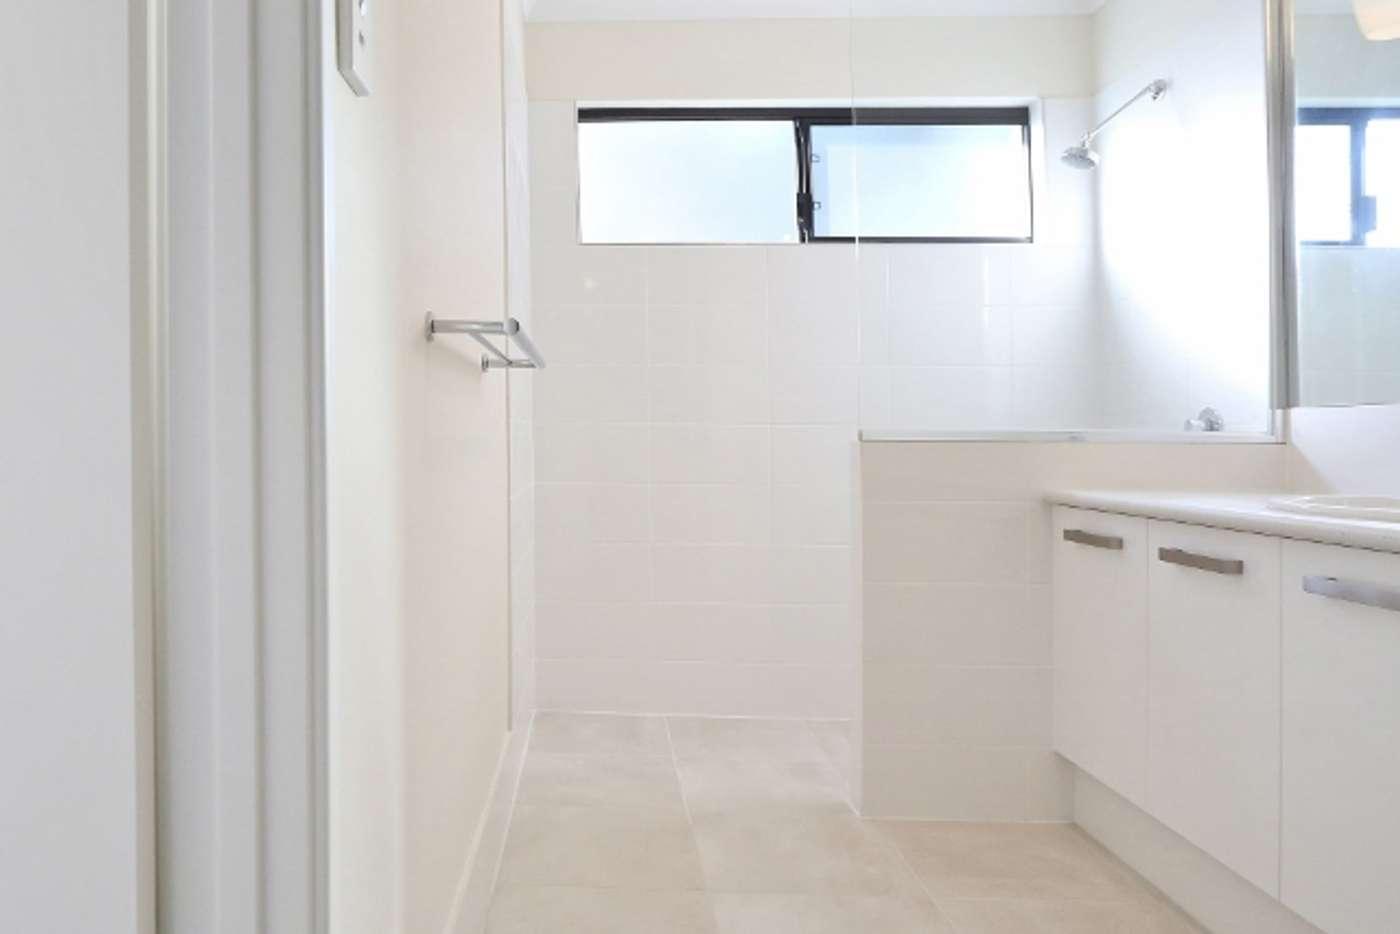 Sixth view of Homely house listing, 30C Muir Street, Innaloo WA 6018